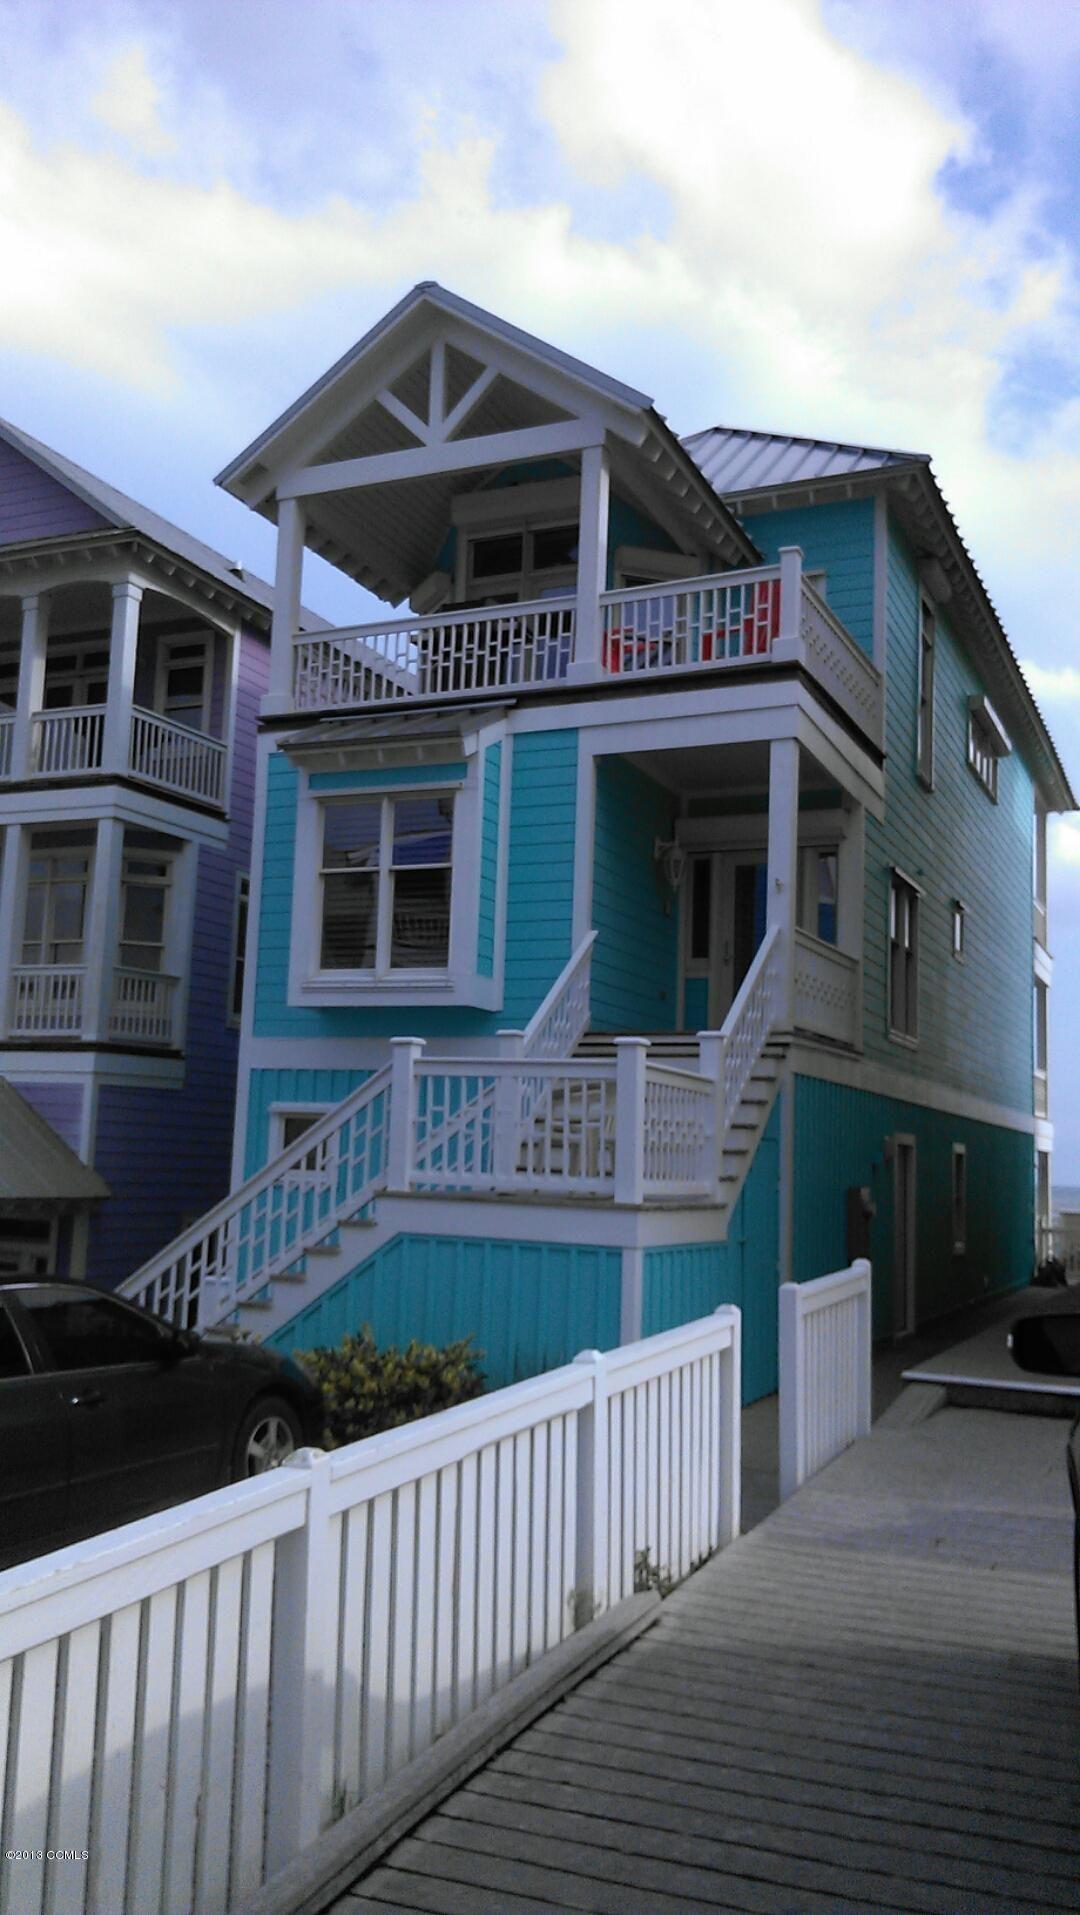 MLS 134440 104 Sandpiper Ct, Atlantic Beach, NC, 28512